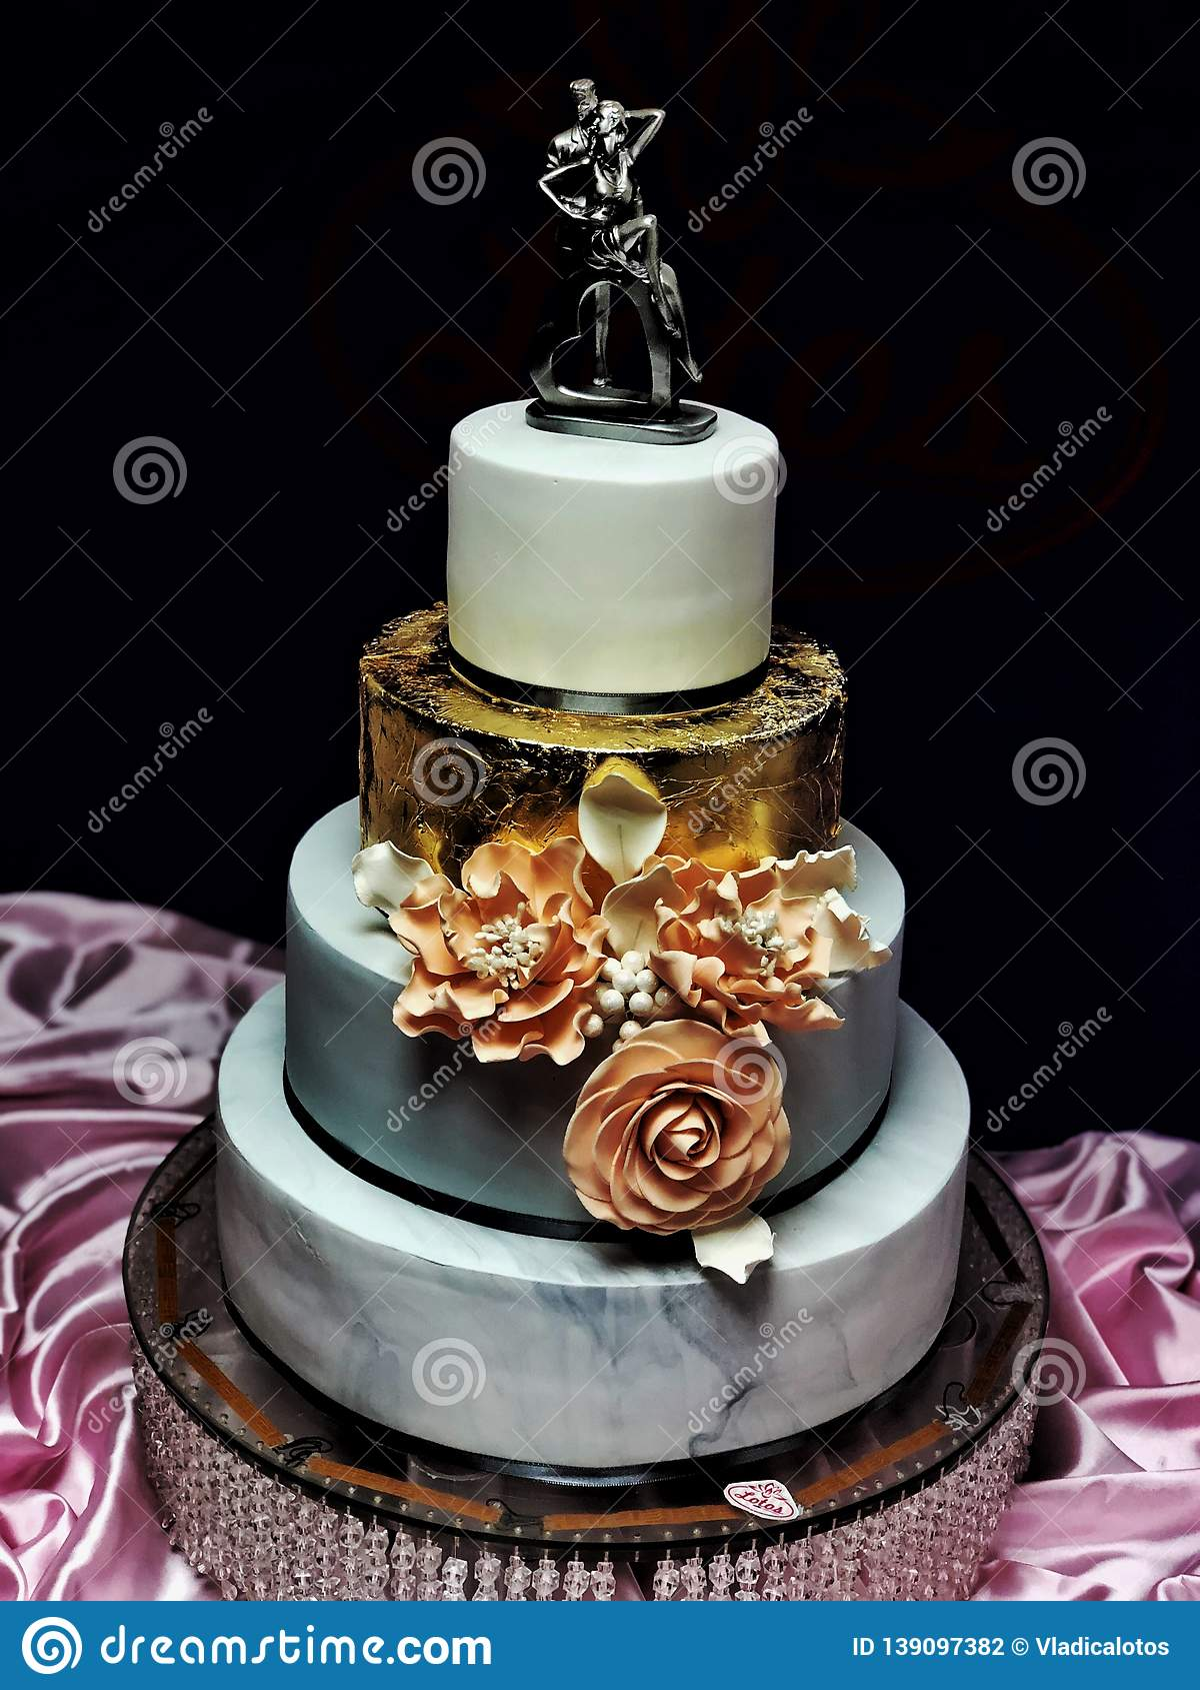 Brilliant Wedding Cake Day Luxury Cake Dream Sweet Royal Stock Photo Image Funny Birthday Cards Online Inifodamsfinfo